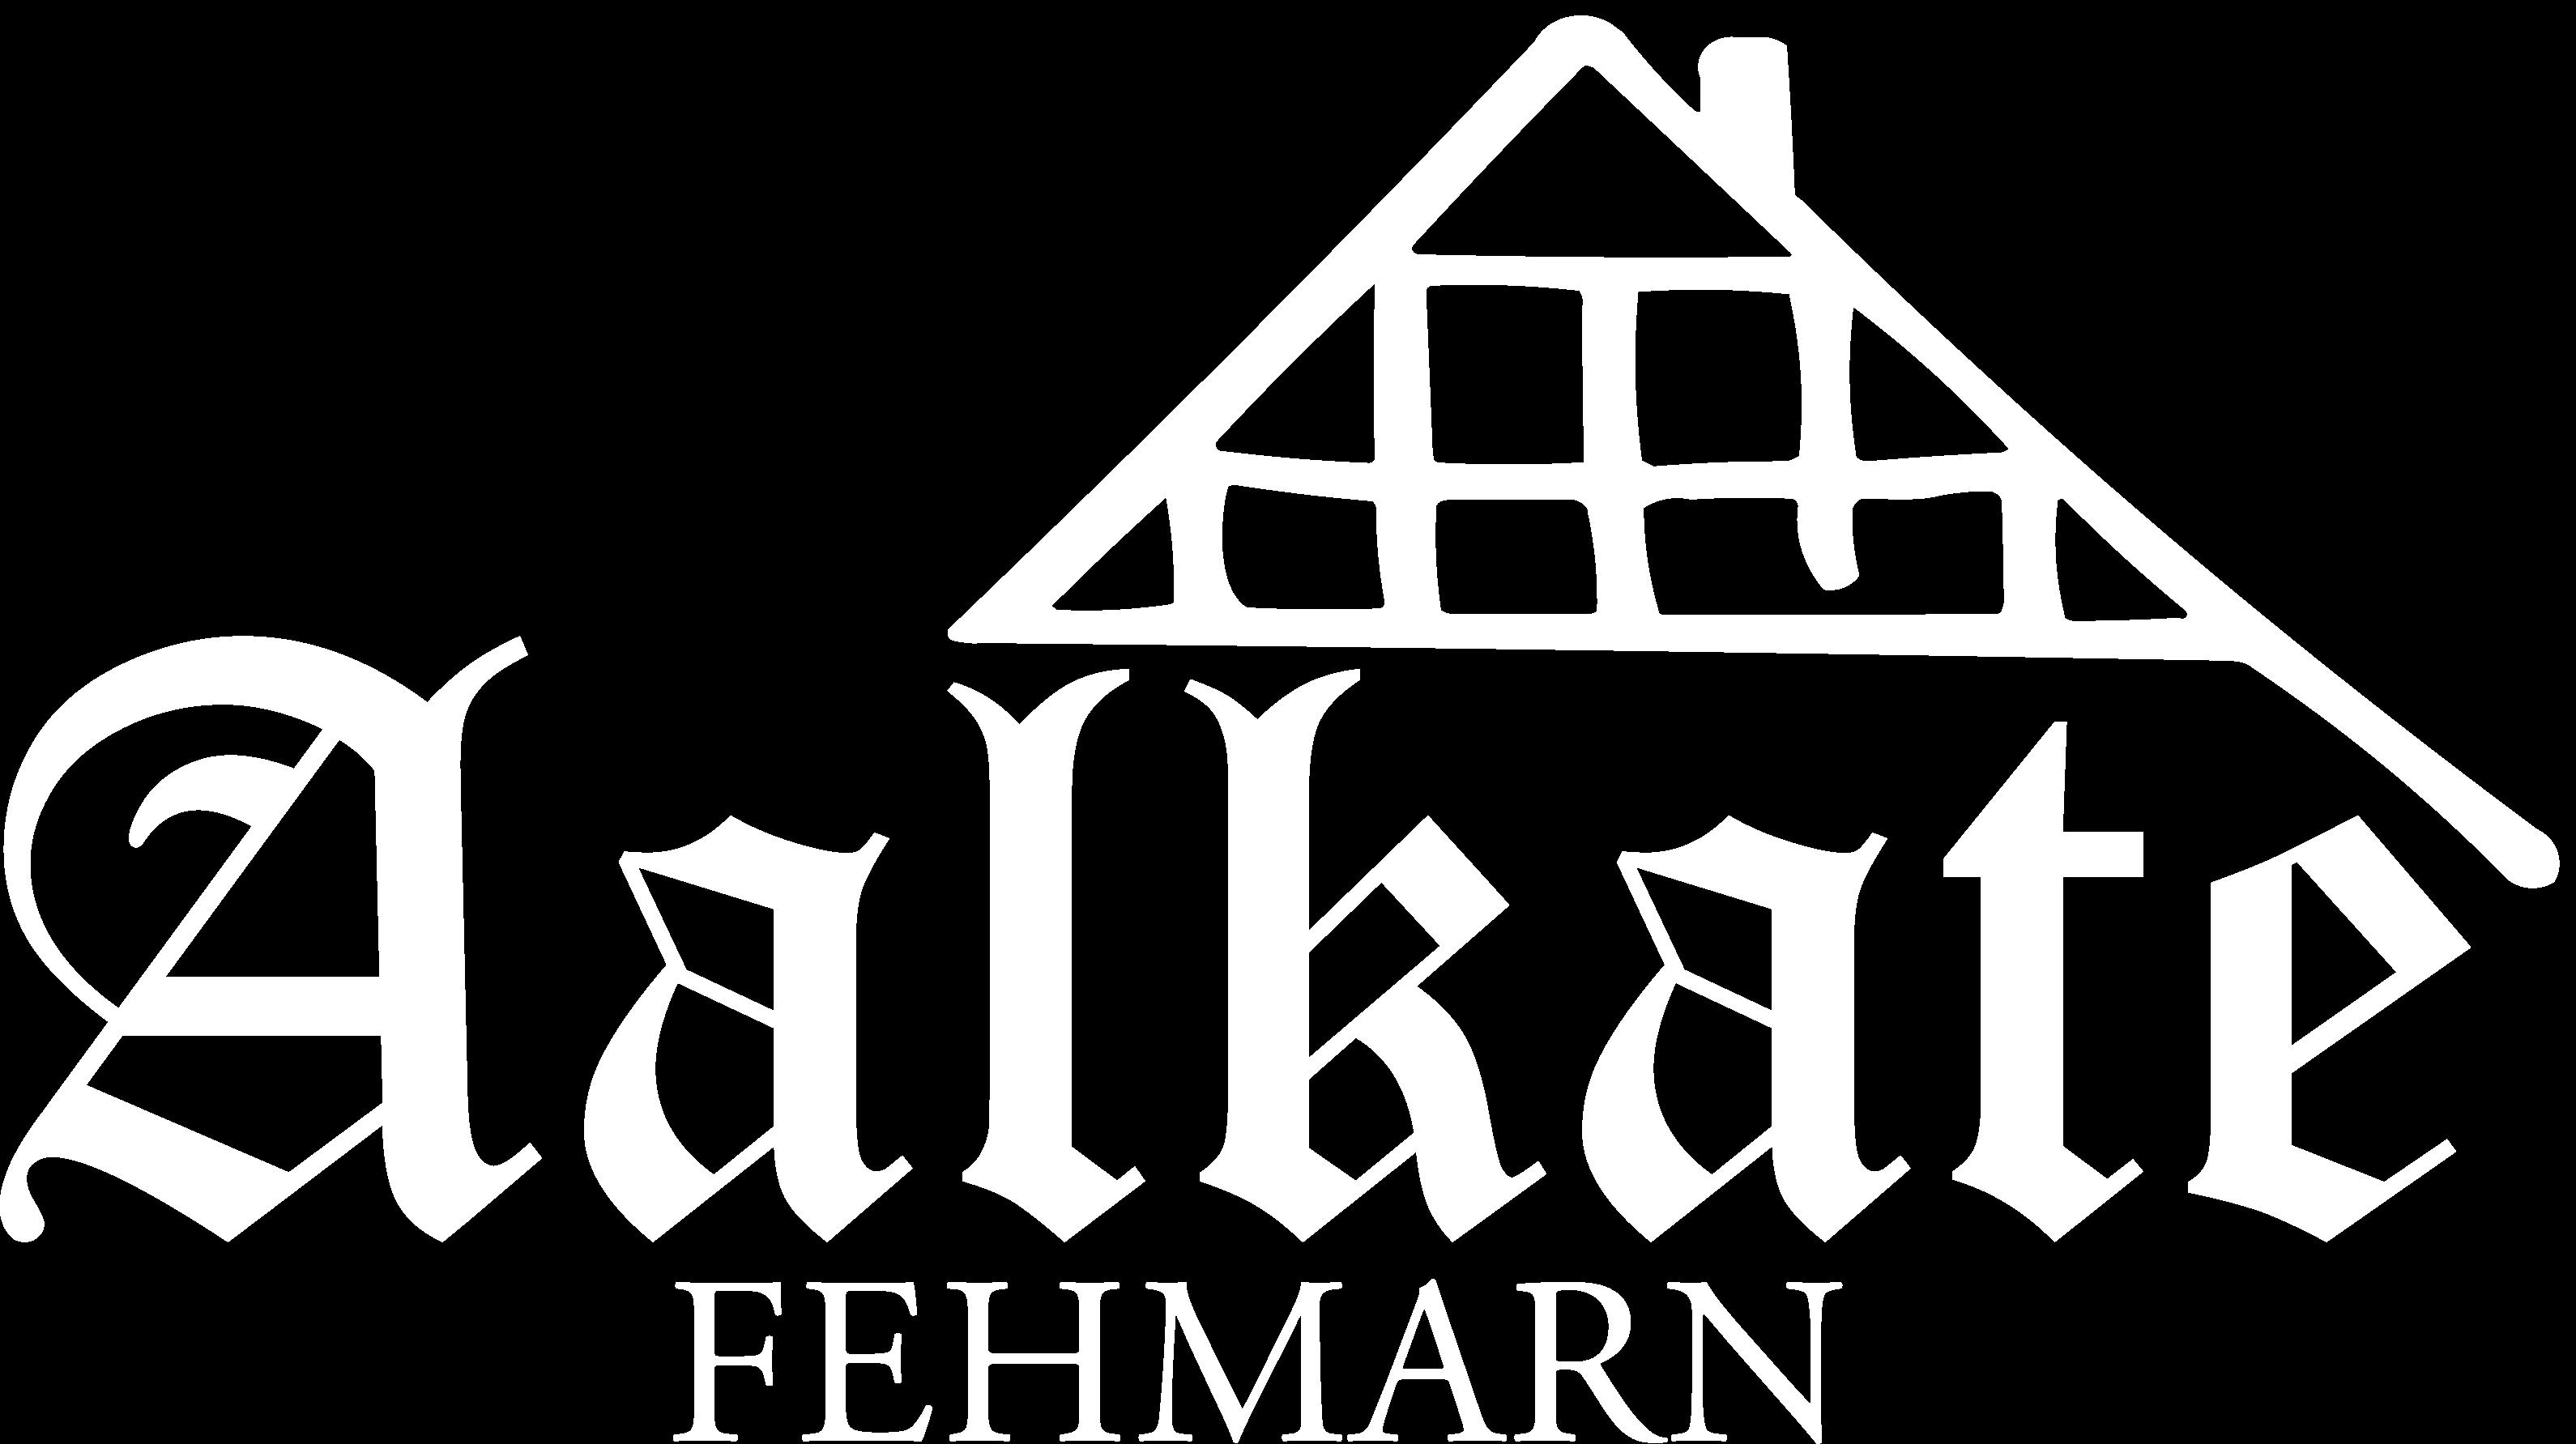 Aalkate_Fehmarn_Logo_FINAL